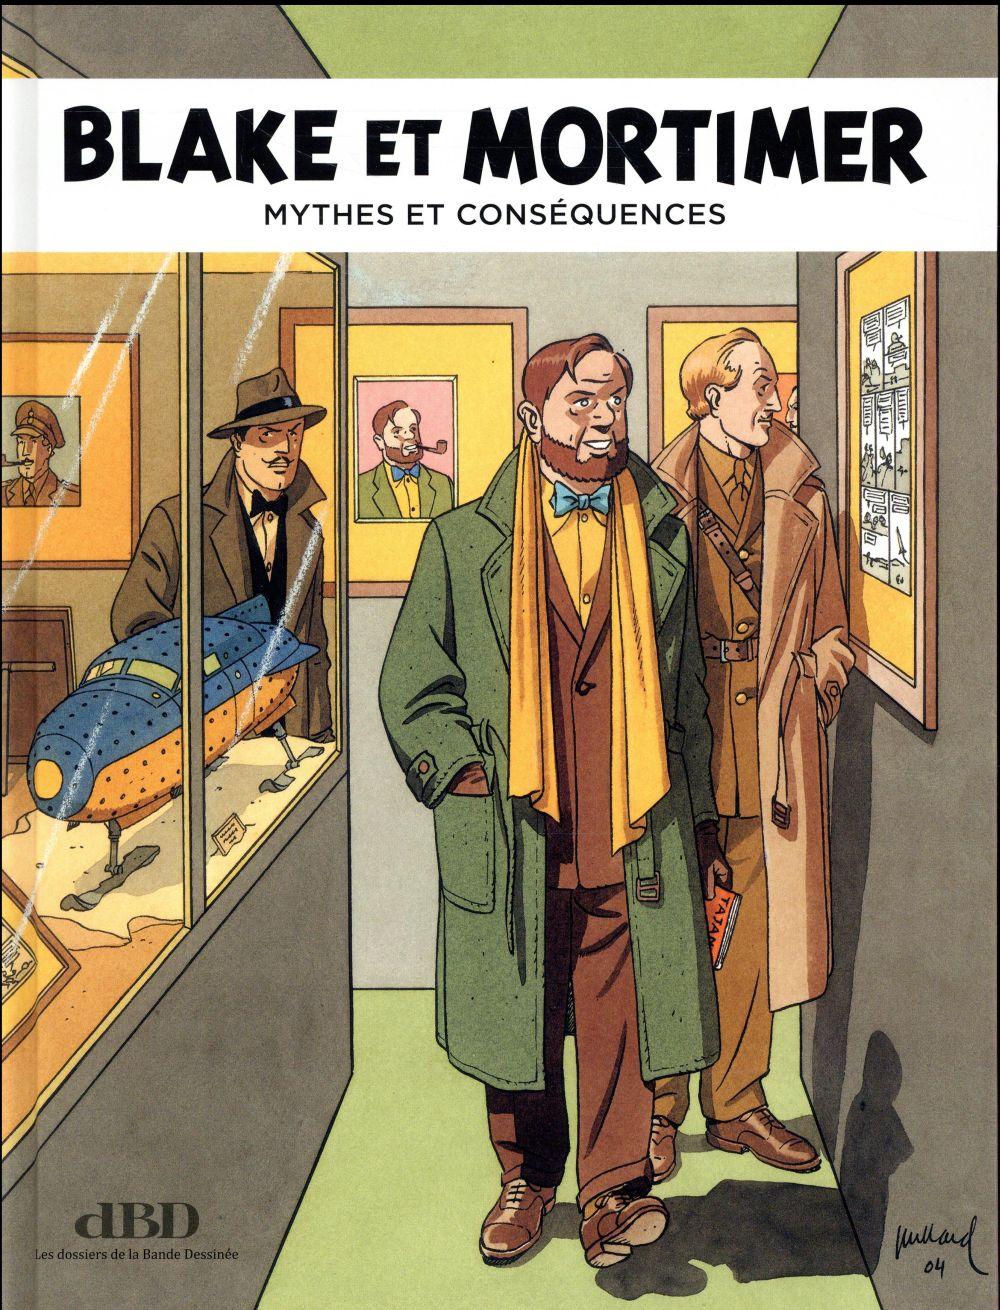 Dbd magazine hors-serie n.18 ; blake et mortimer ; mythes et consequences